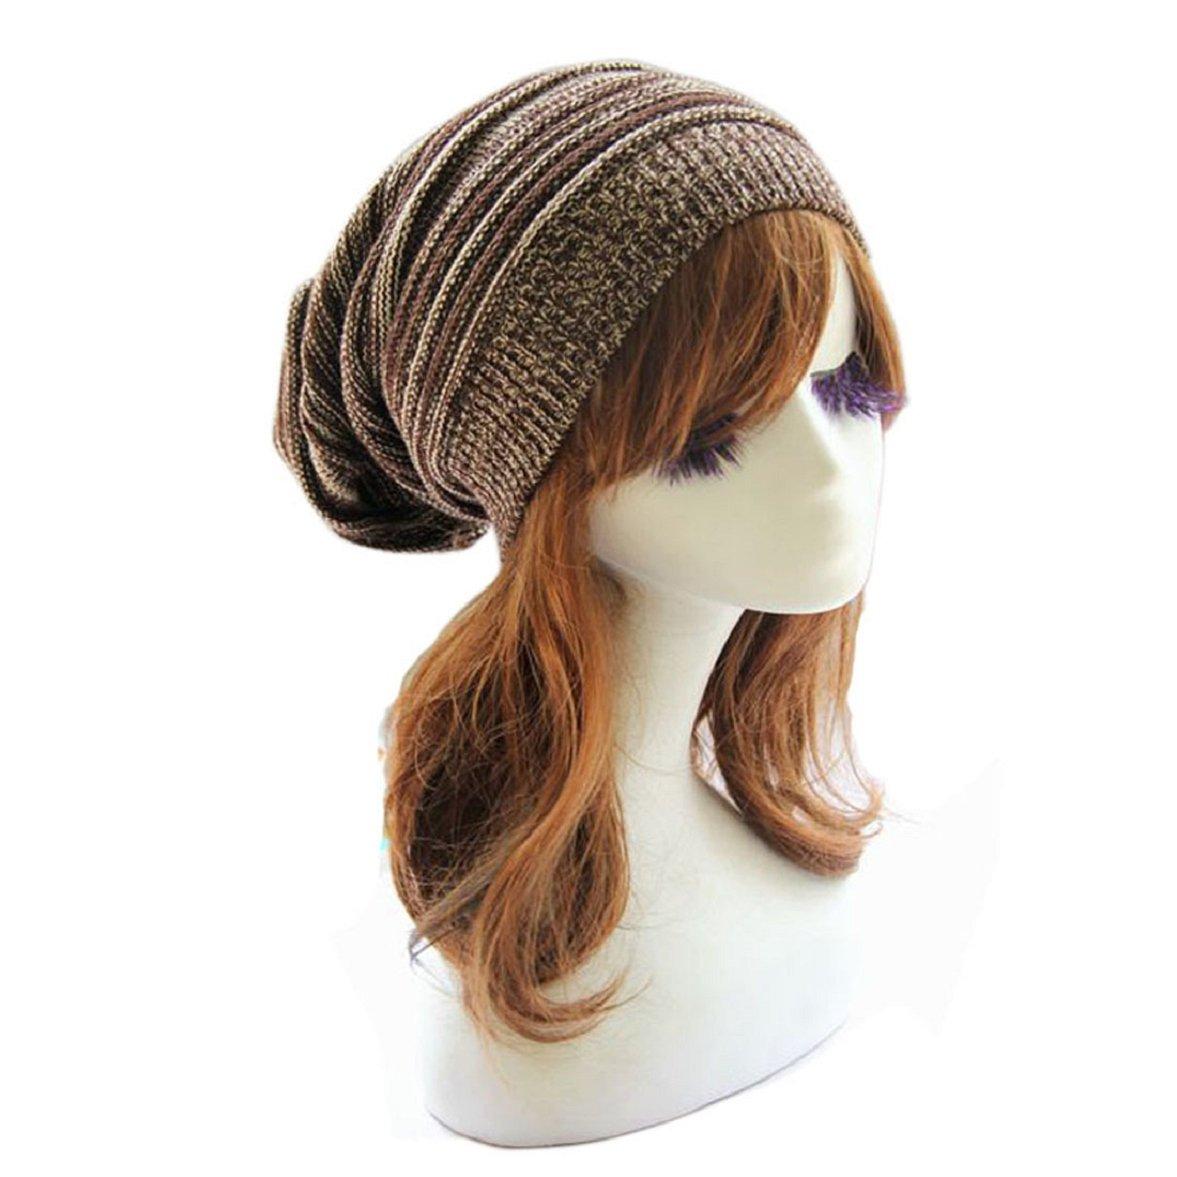 Sandistore Unisex Knit Baggy Beanie Beret Winter Warm Oversized Ski Cap Hat (Coffee) by Sandistore (Image #1)